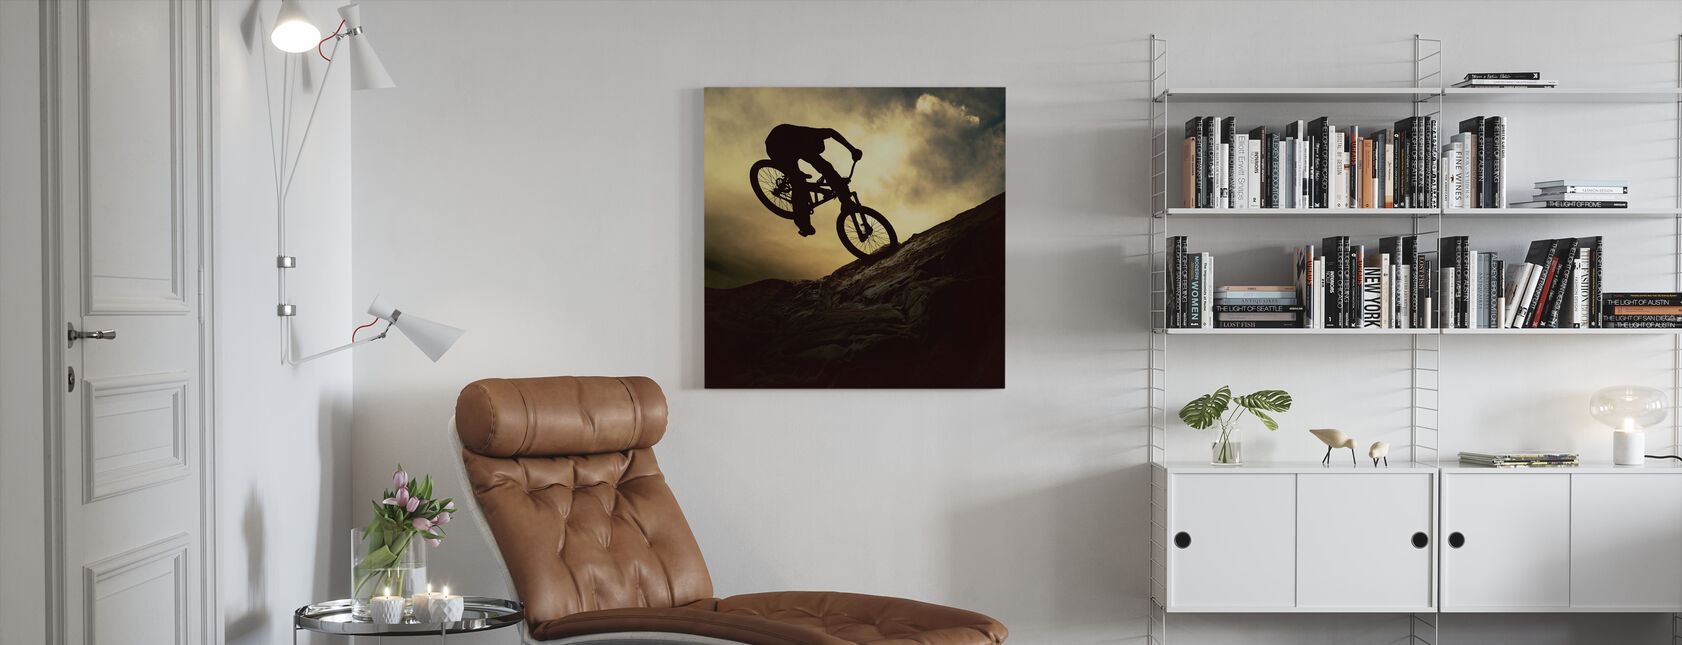 Mountain Bike Rider - Canvas print - Living Room